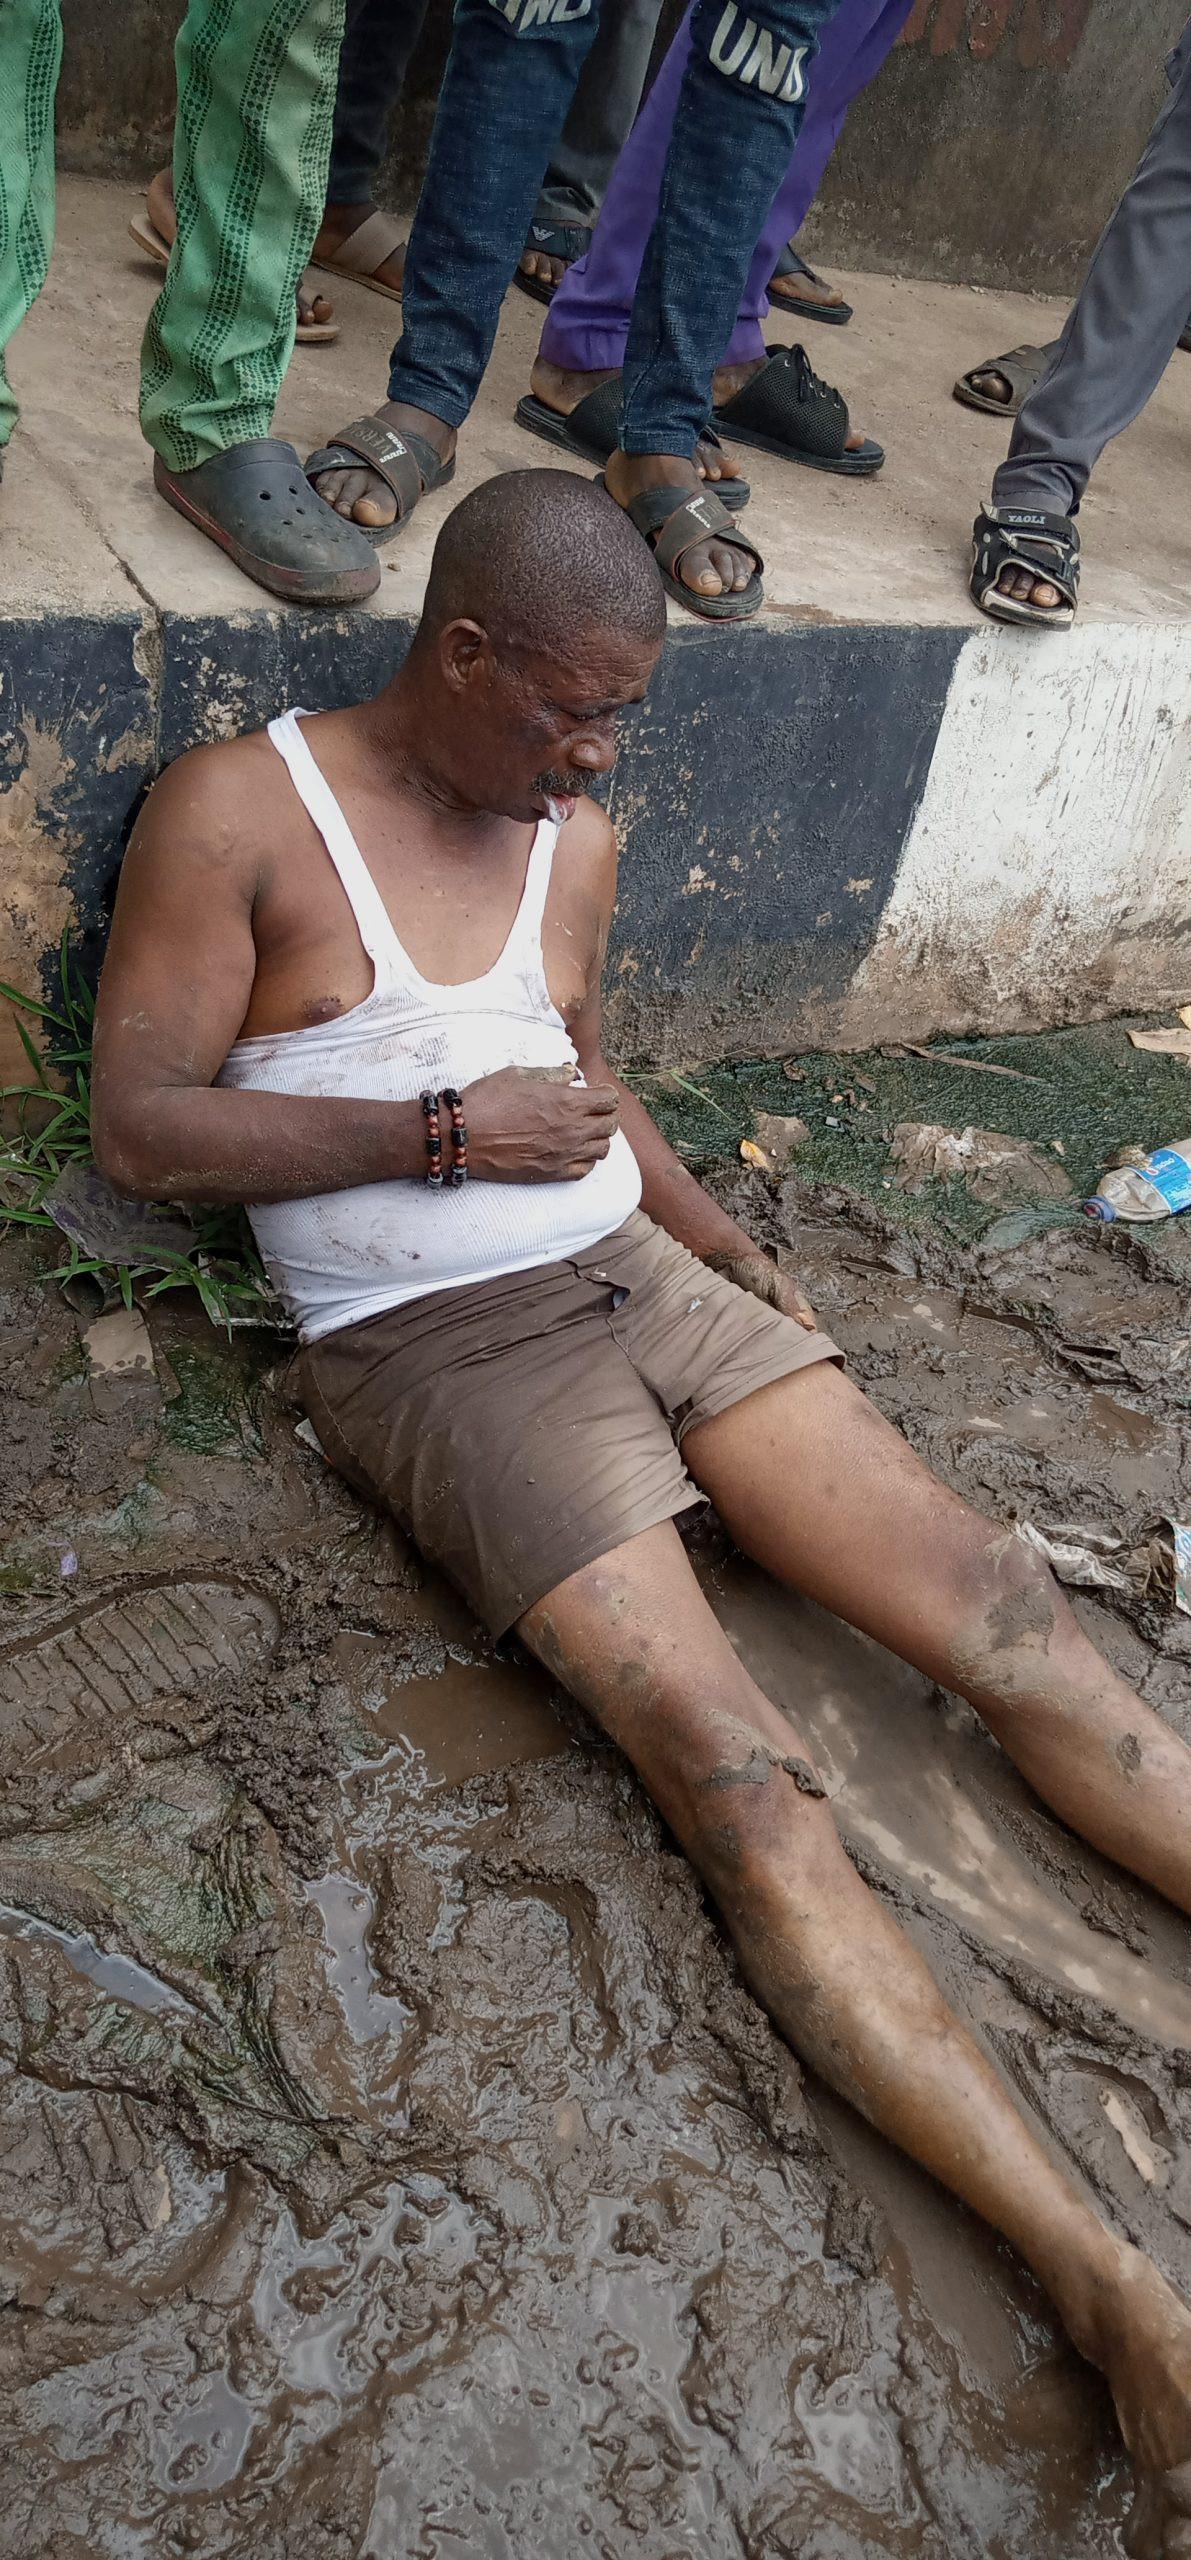 Man allegedly beaten mercilessly by Ogun Parking Management officers (photos)